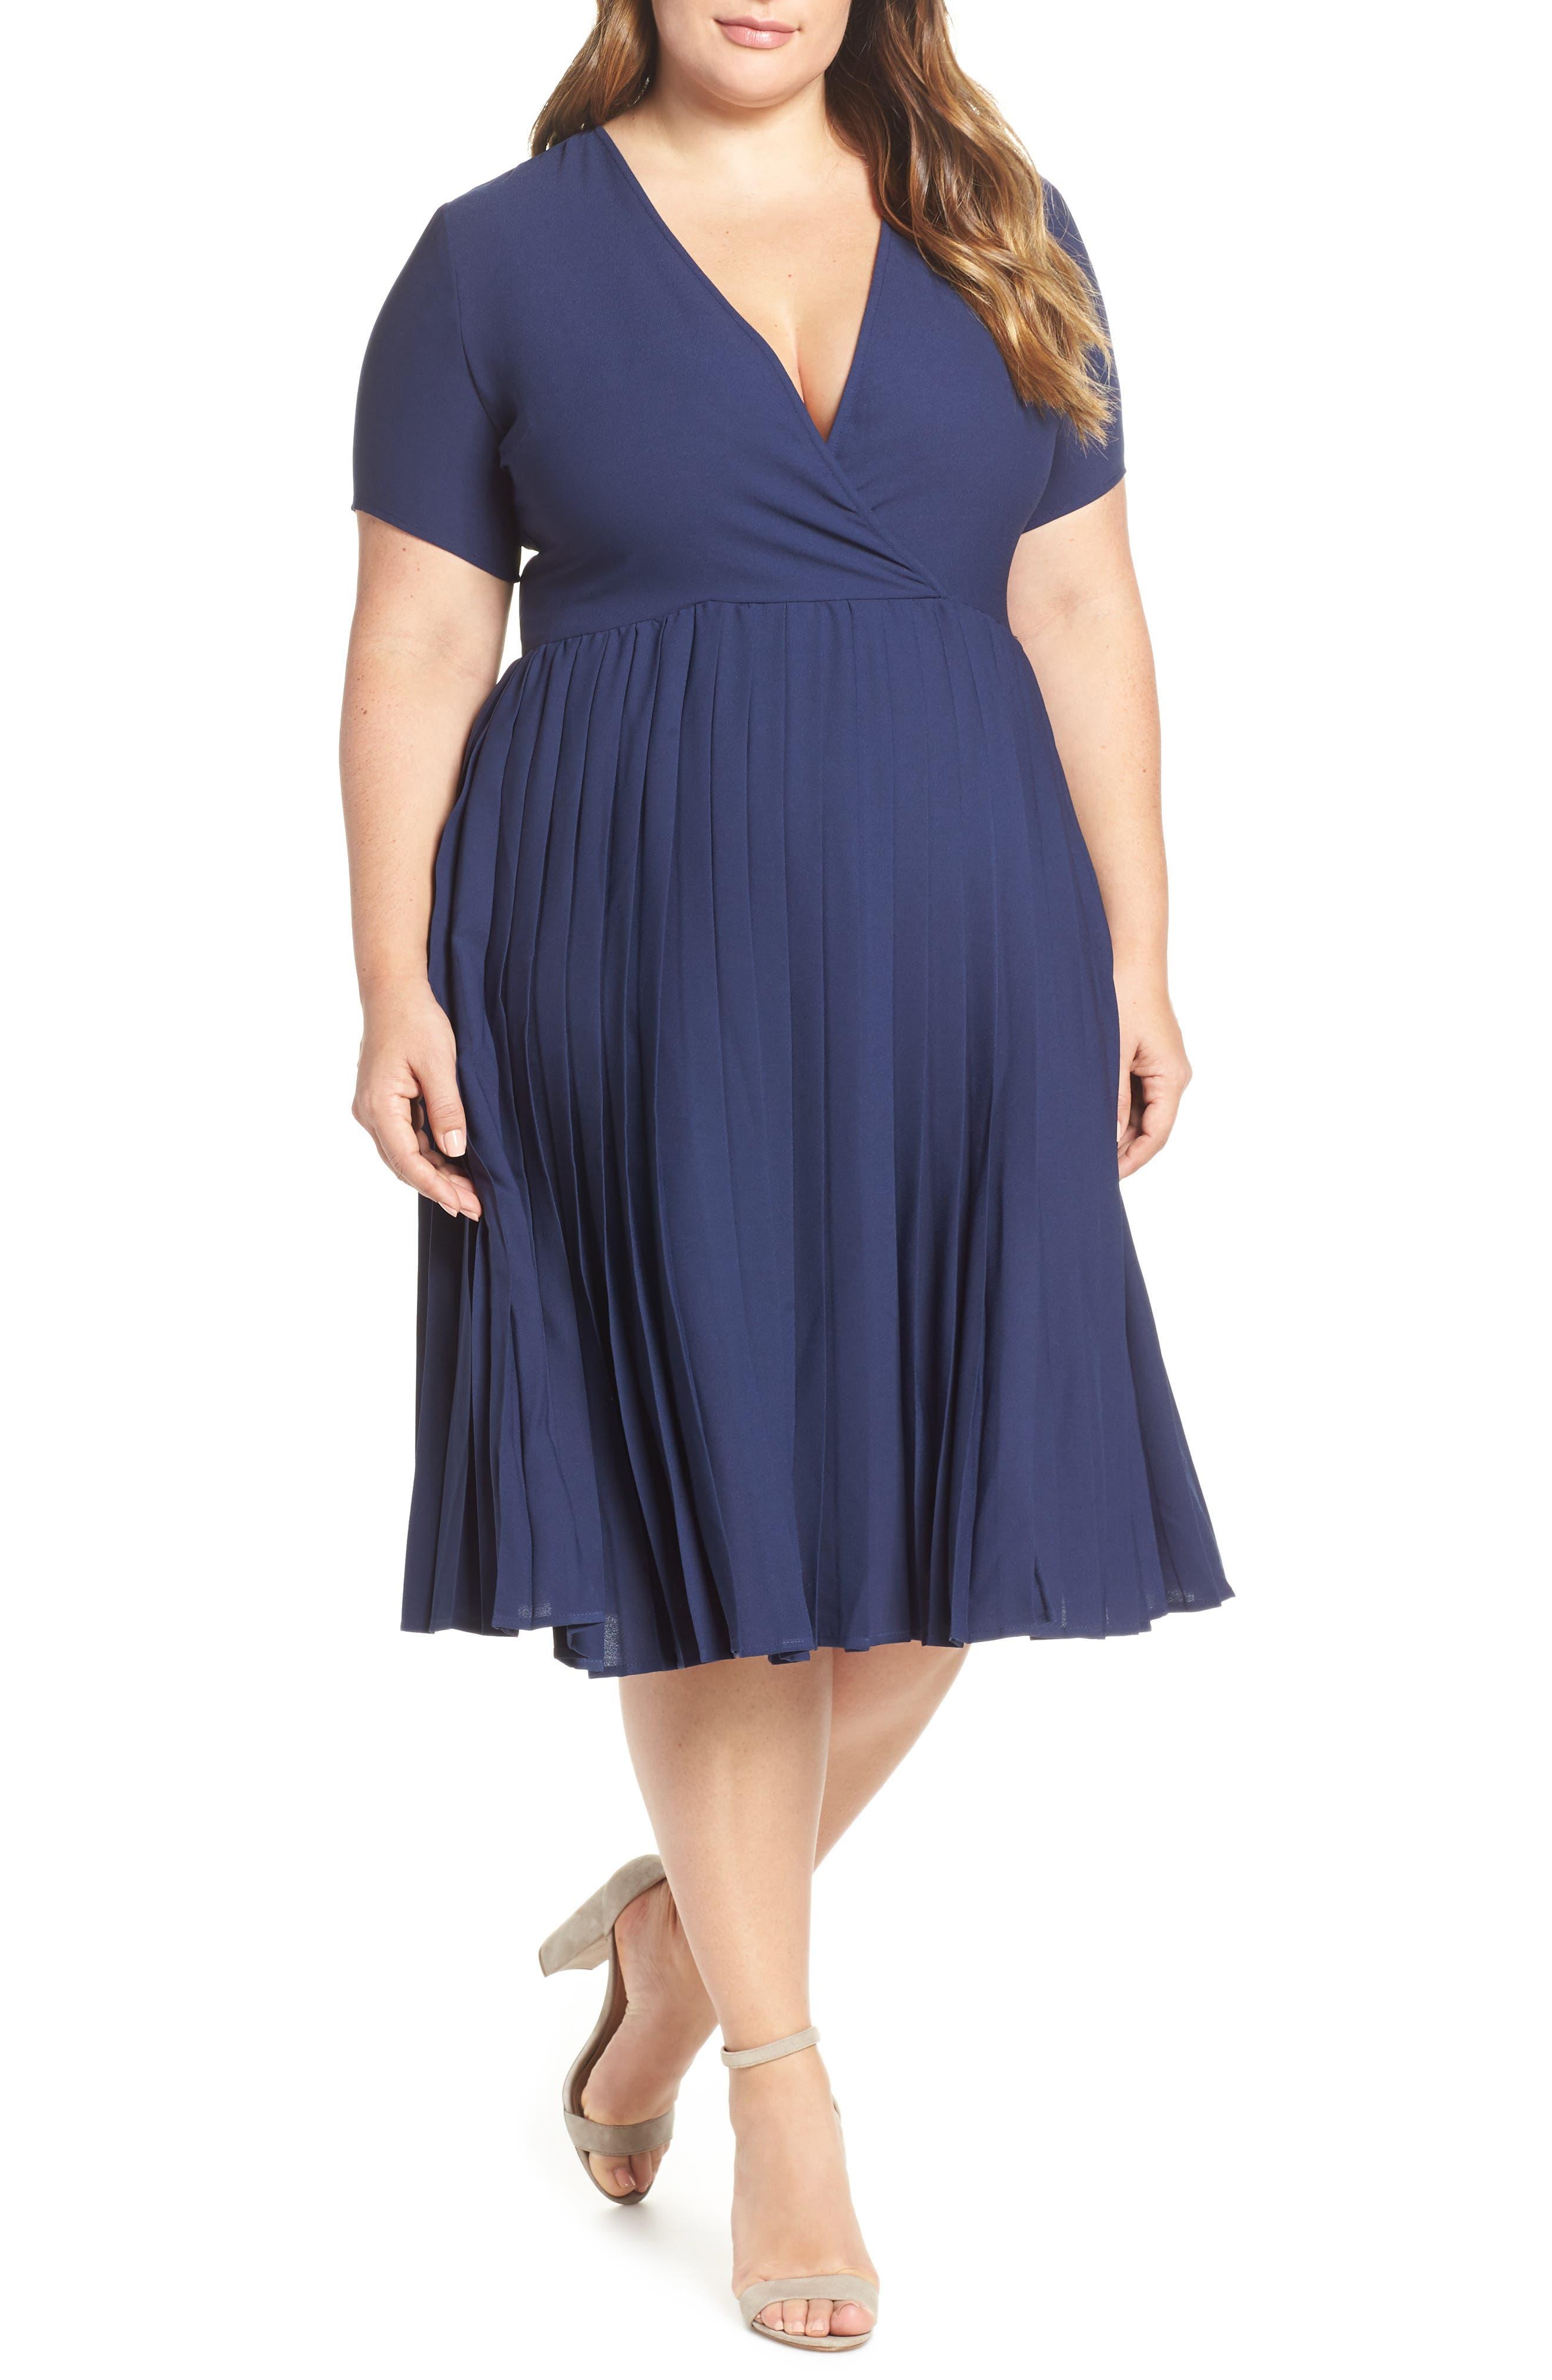 LEITH,                             Pleated Surplice Dress,                             Alternate thumbnail 2, color,                             NAVY PEACOAT